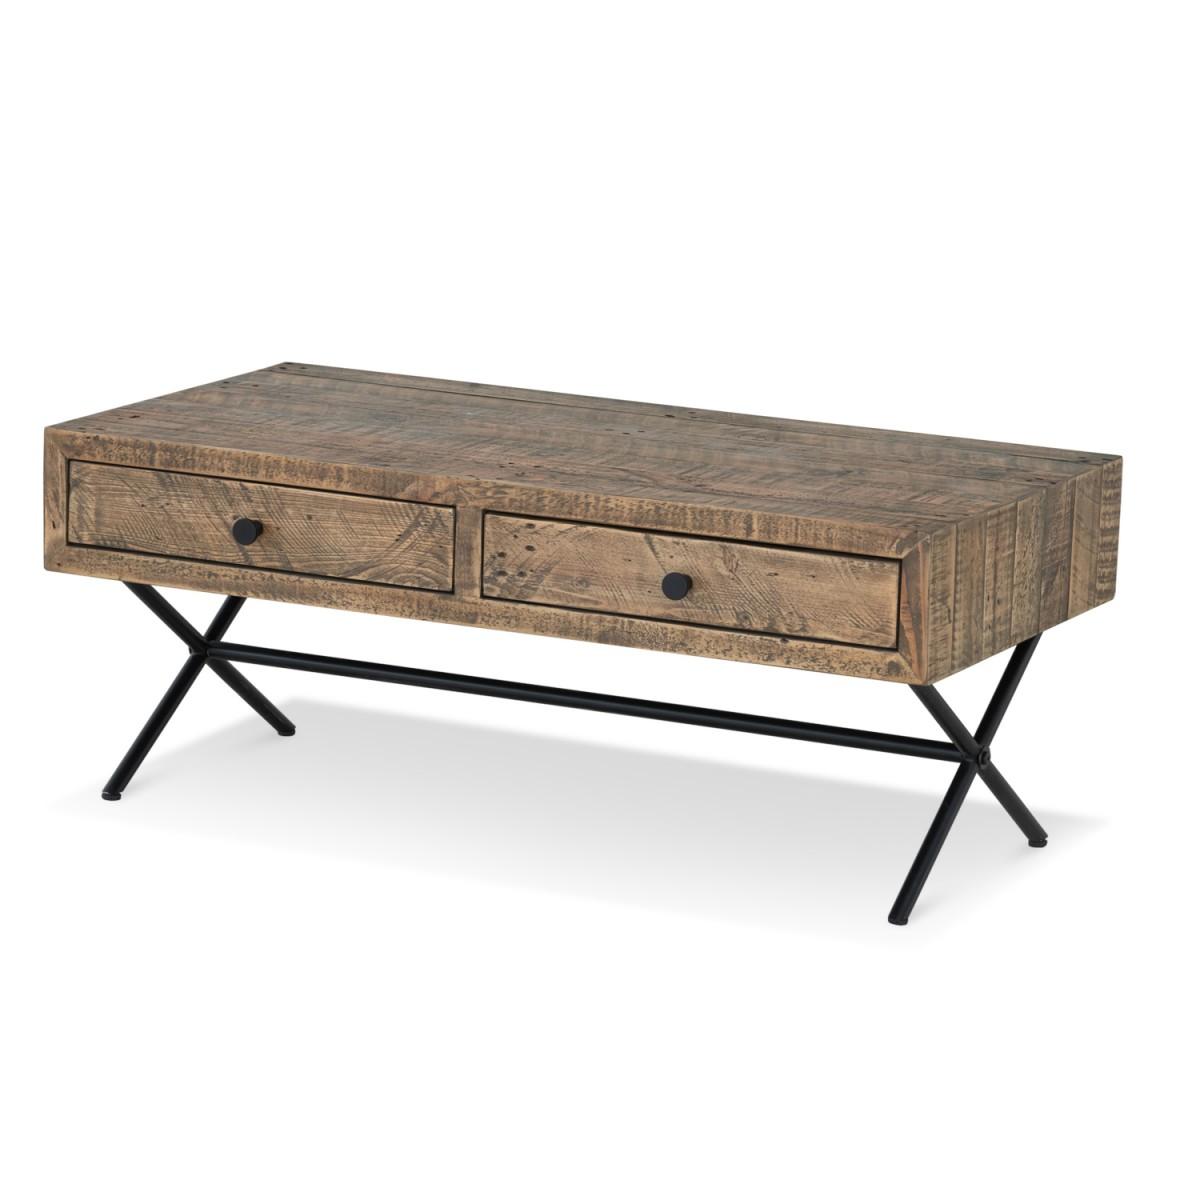 Table basse 2 Tiroirs Bois Métal Marron 100x50x40cm